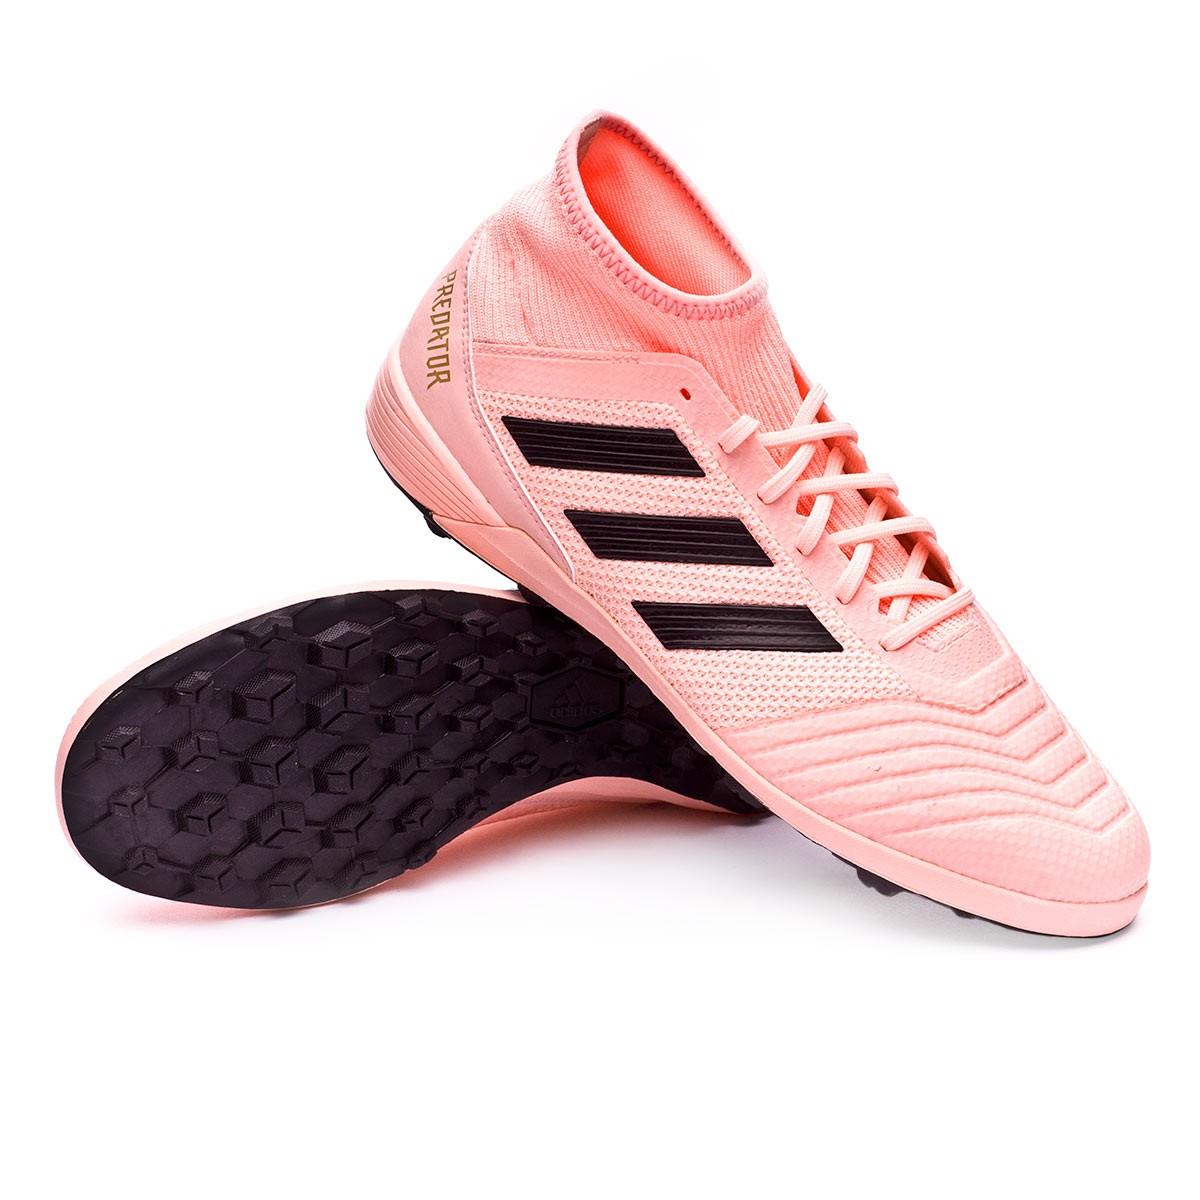 de00476f25 adidas Predator Tango 18.3 Turf Football Boot. Clear orange-Black-Trace pink  ...